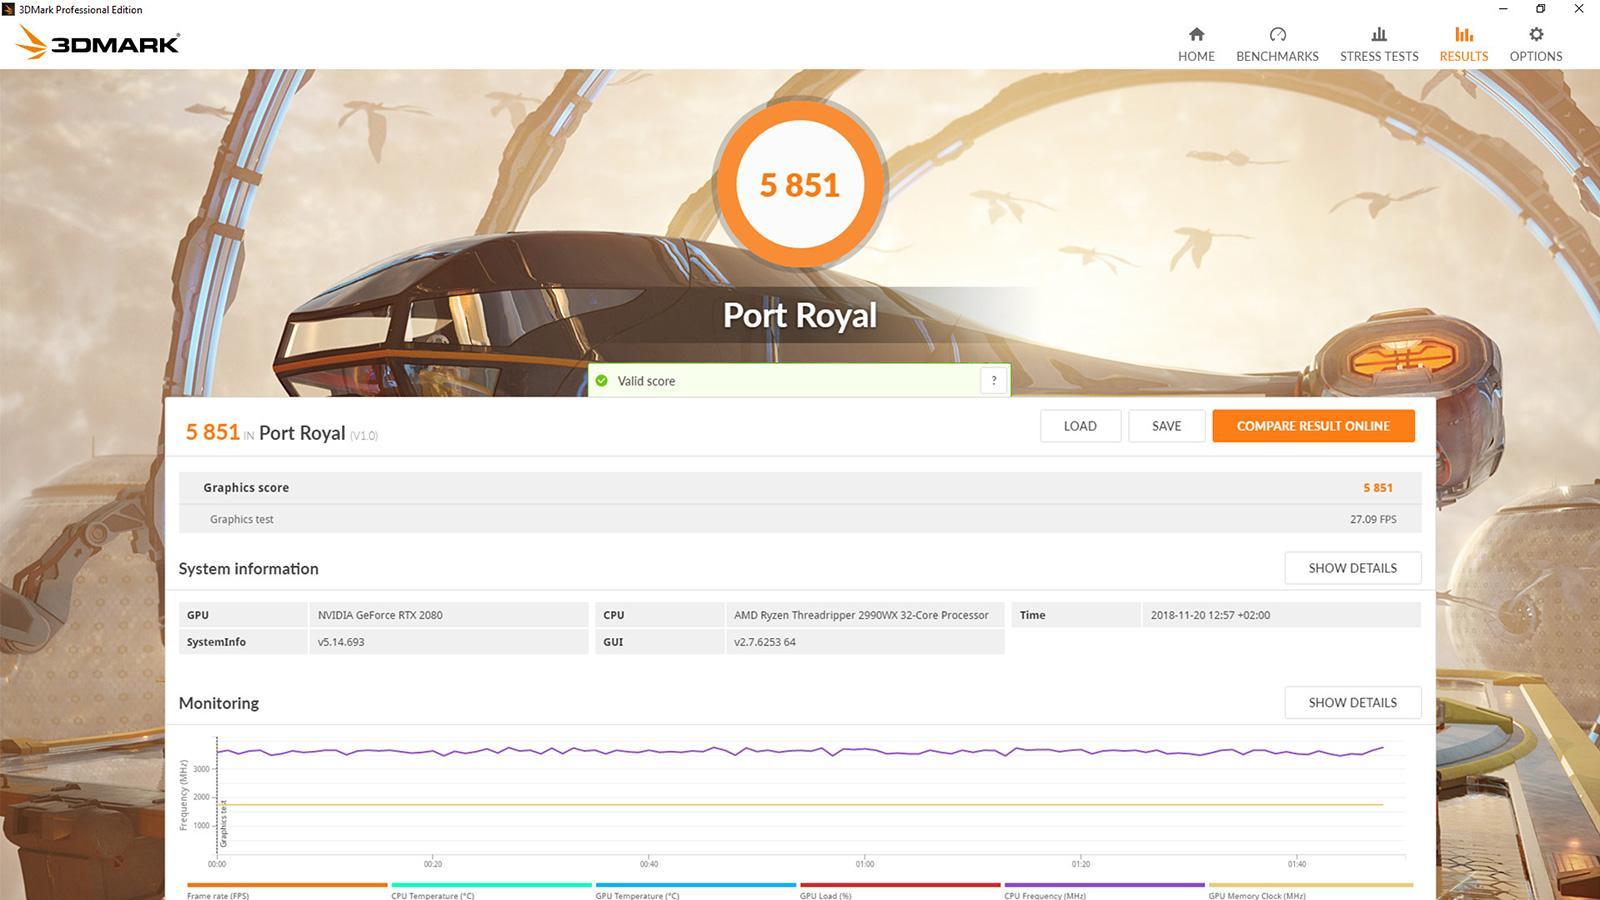 Бенчмарк 3DMark Port Royal доступен к загрузке